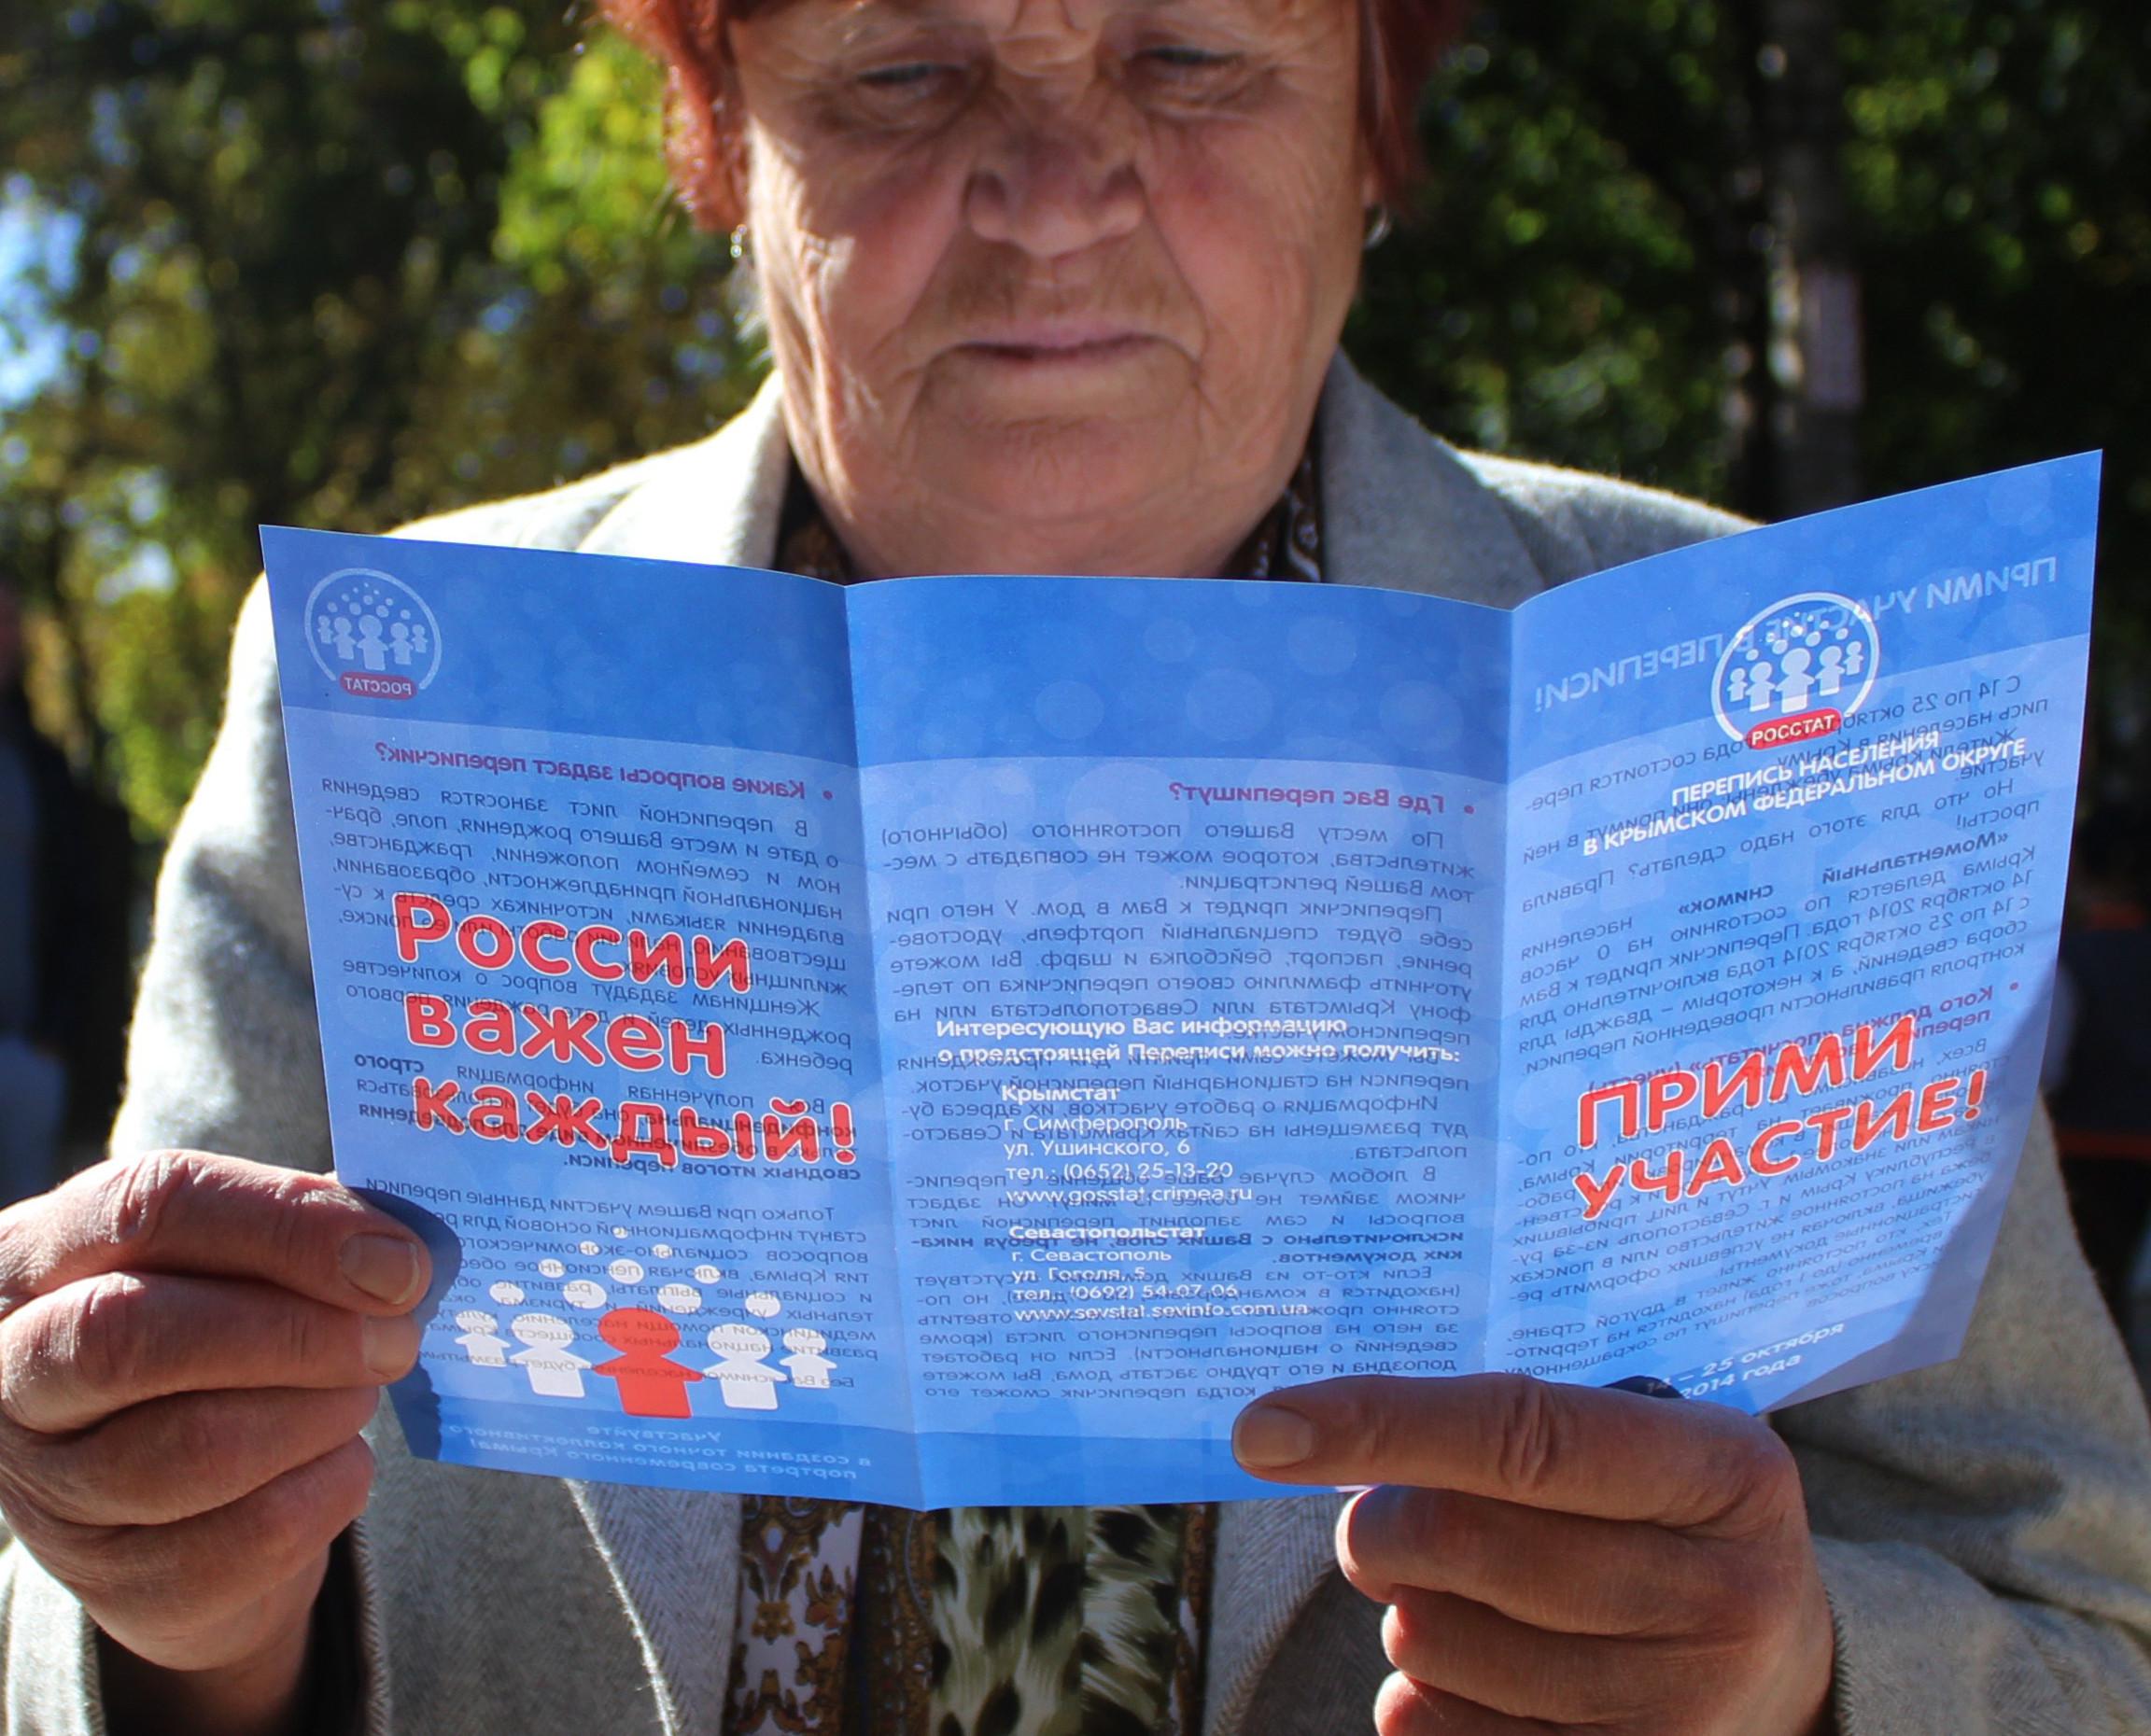 <p>Фото: &copy;РИА Новости/Юрий Лашов</p>